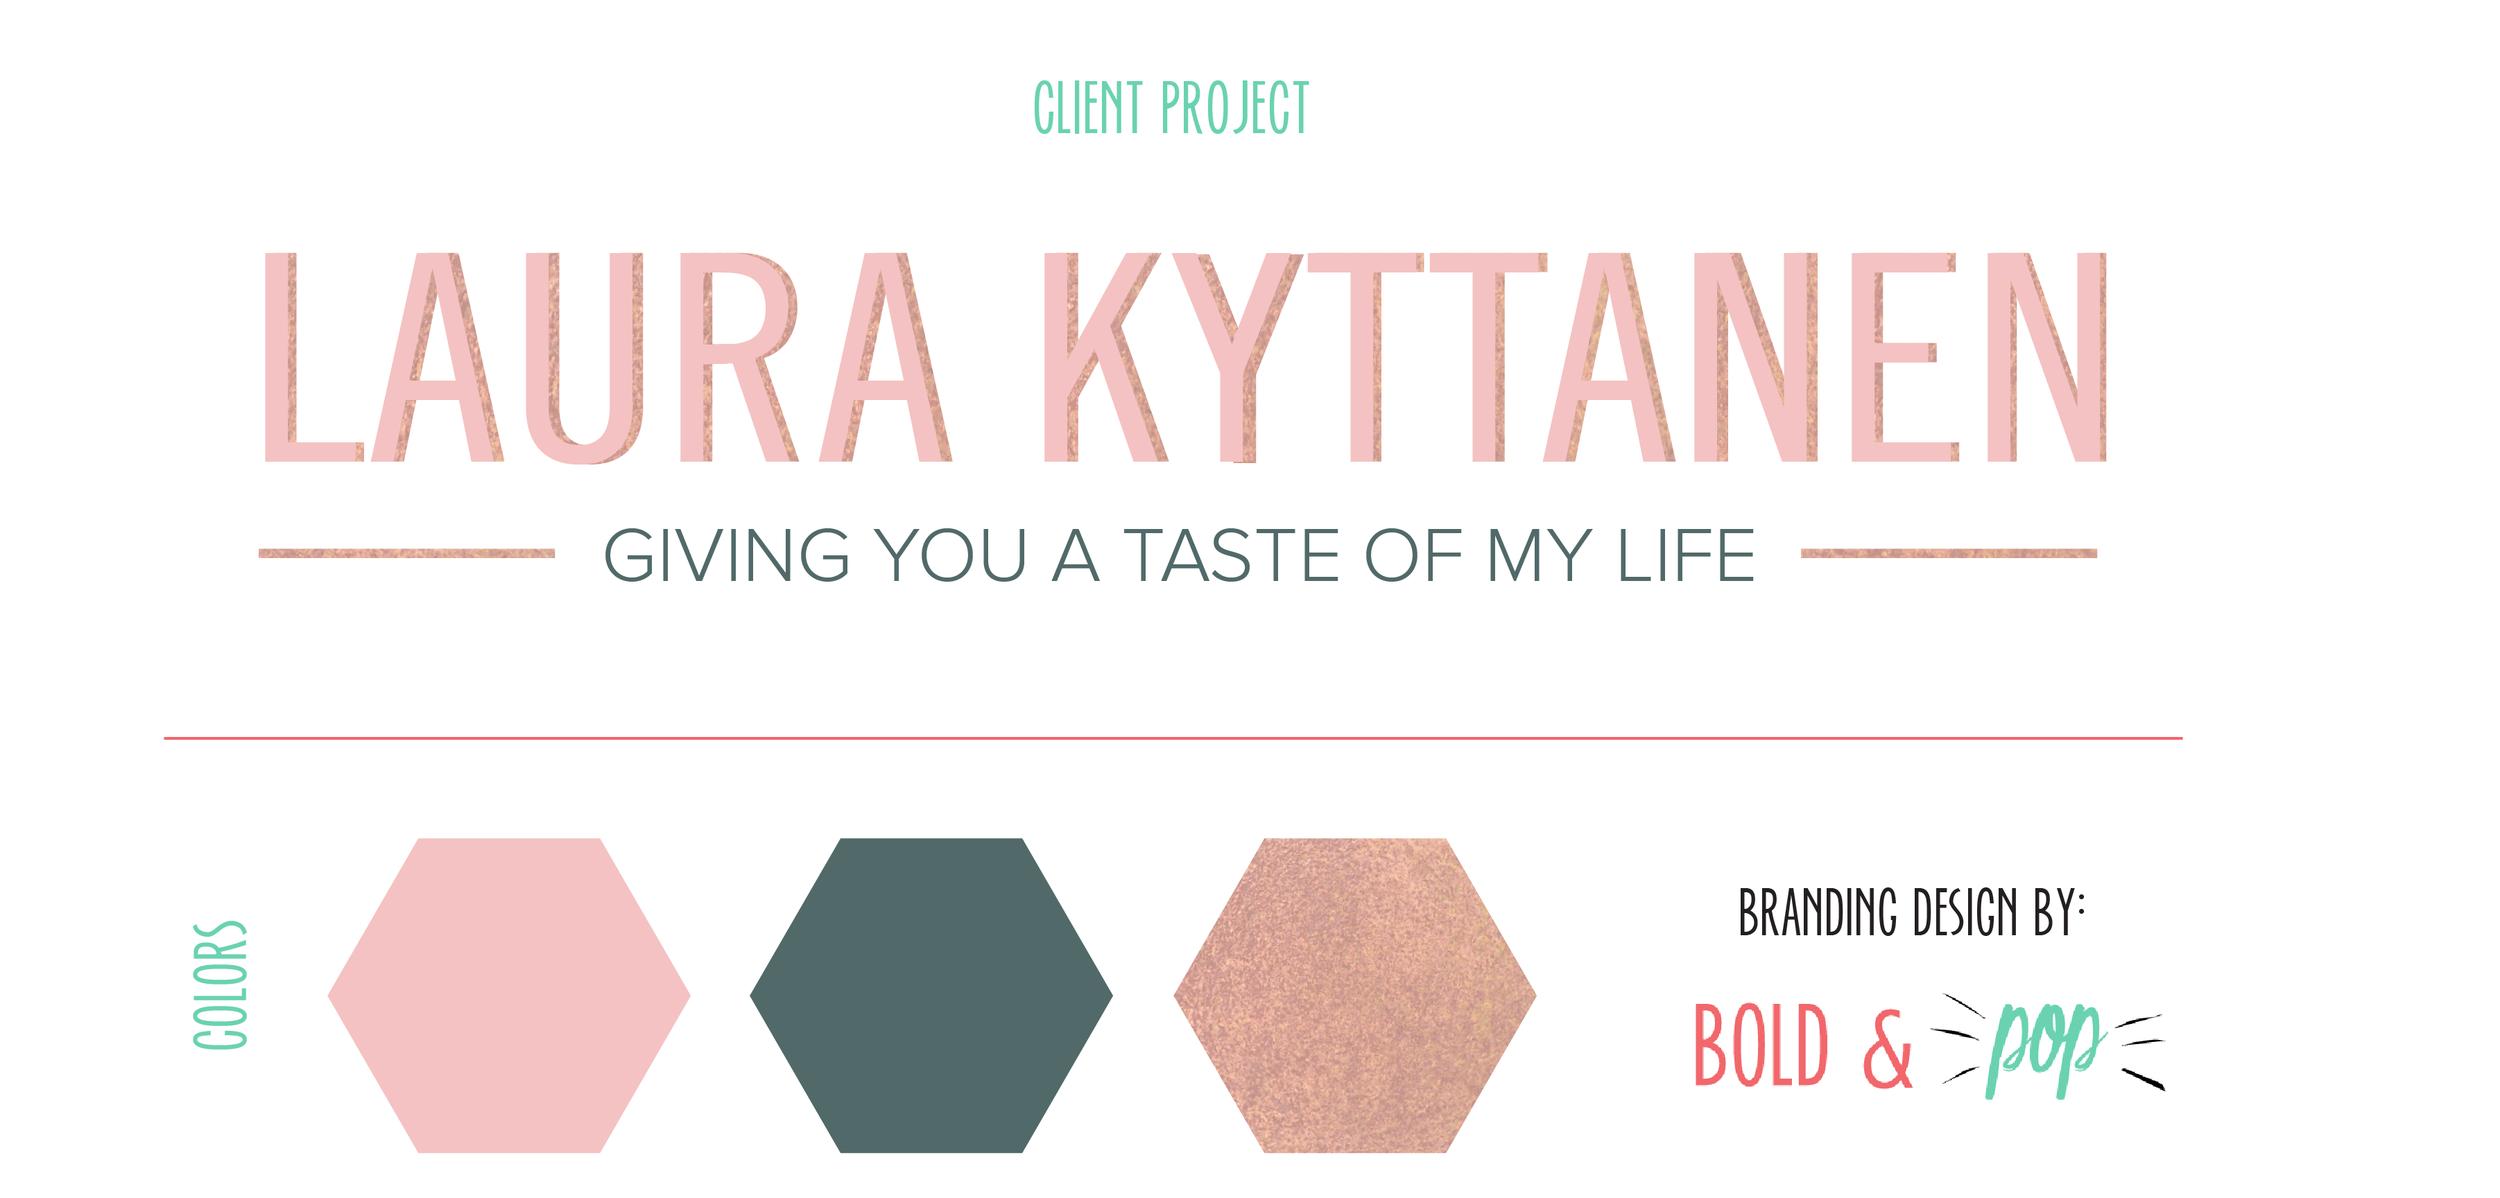 Bold & Pop : Laura Kyttanen Squarespace Blog Refresh